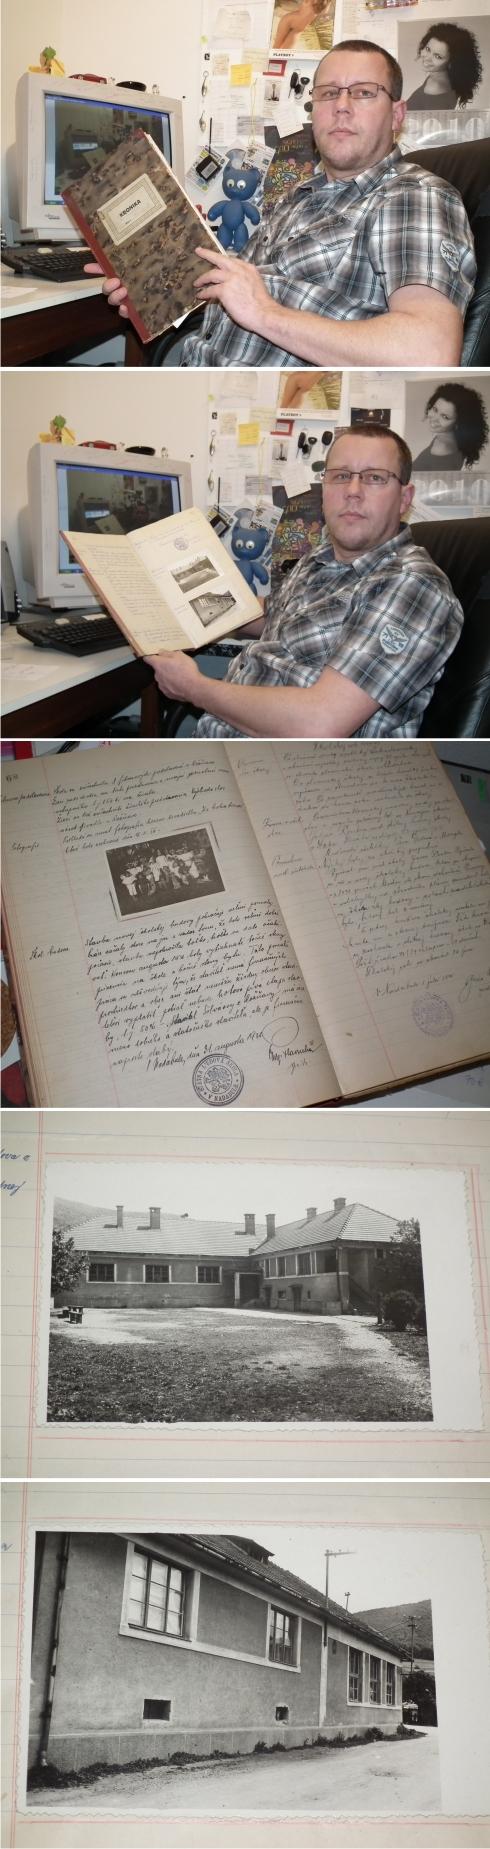 Nadabula - kronika školy - 1899 - 1960